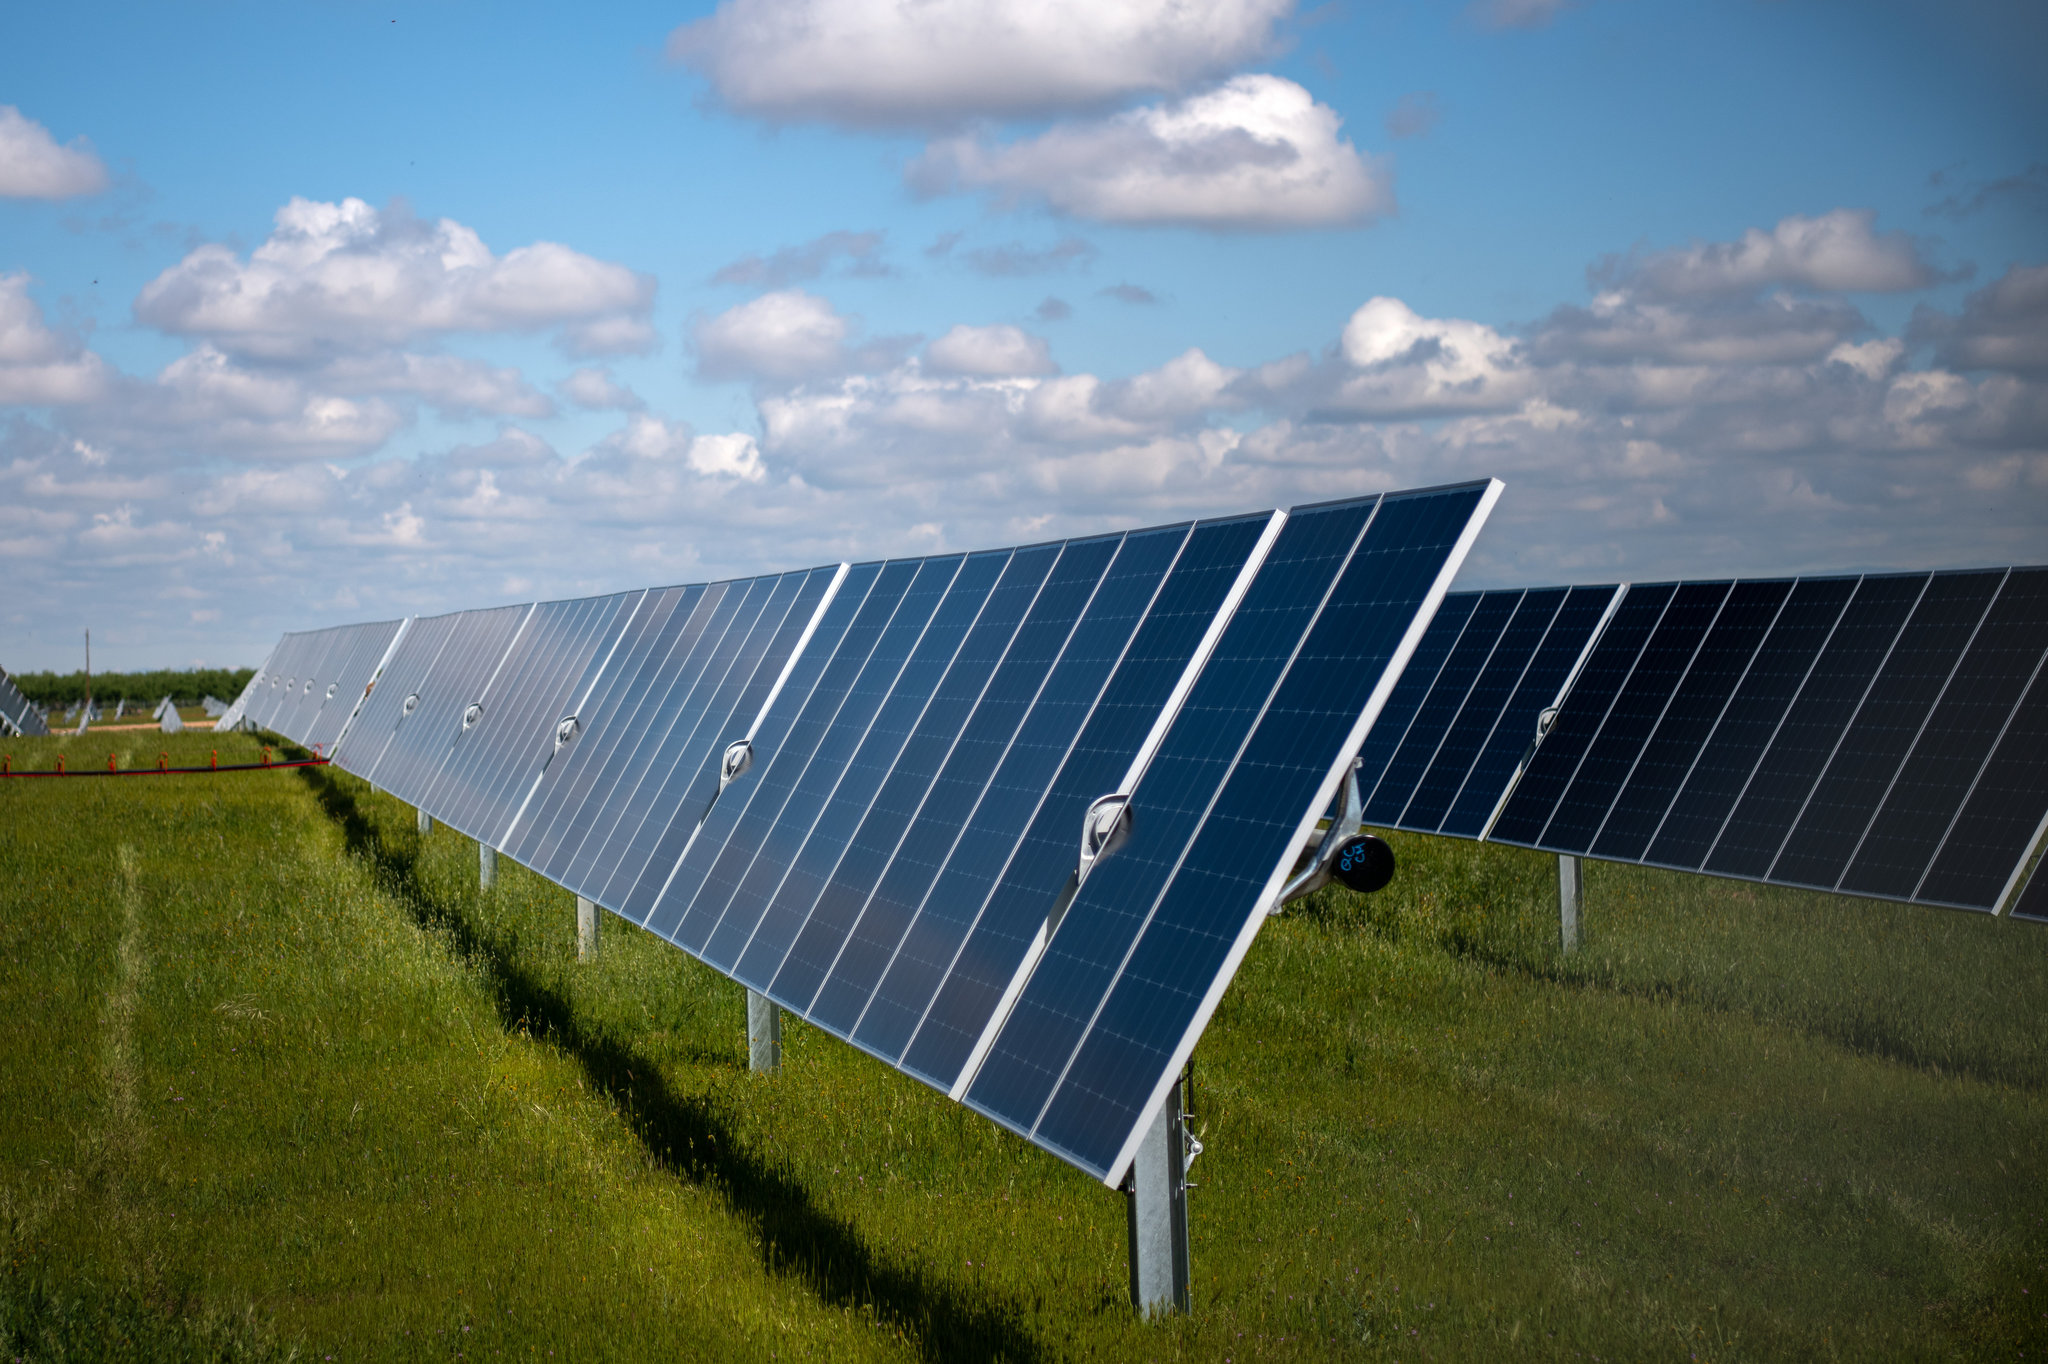 Macquarie's GIG launches new European solar energy company, Cero Generation